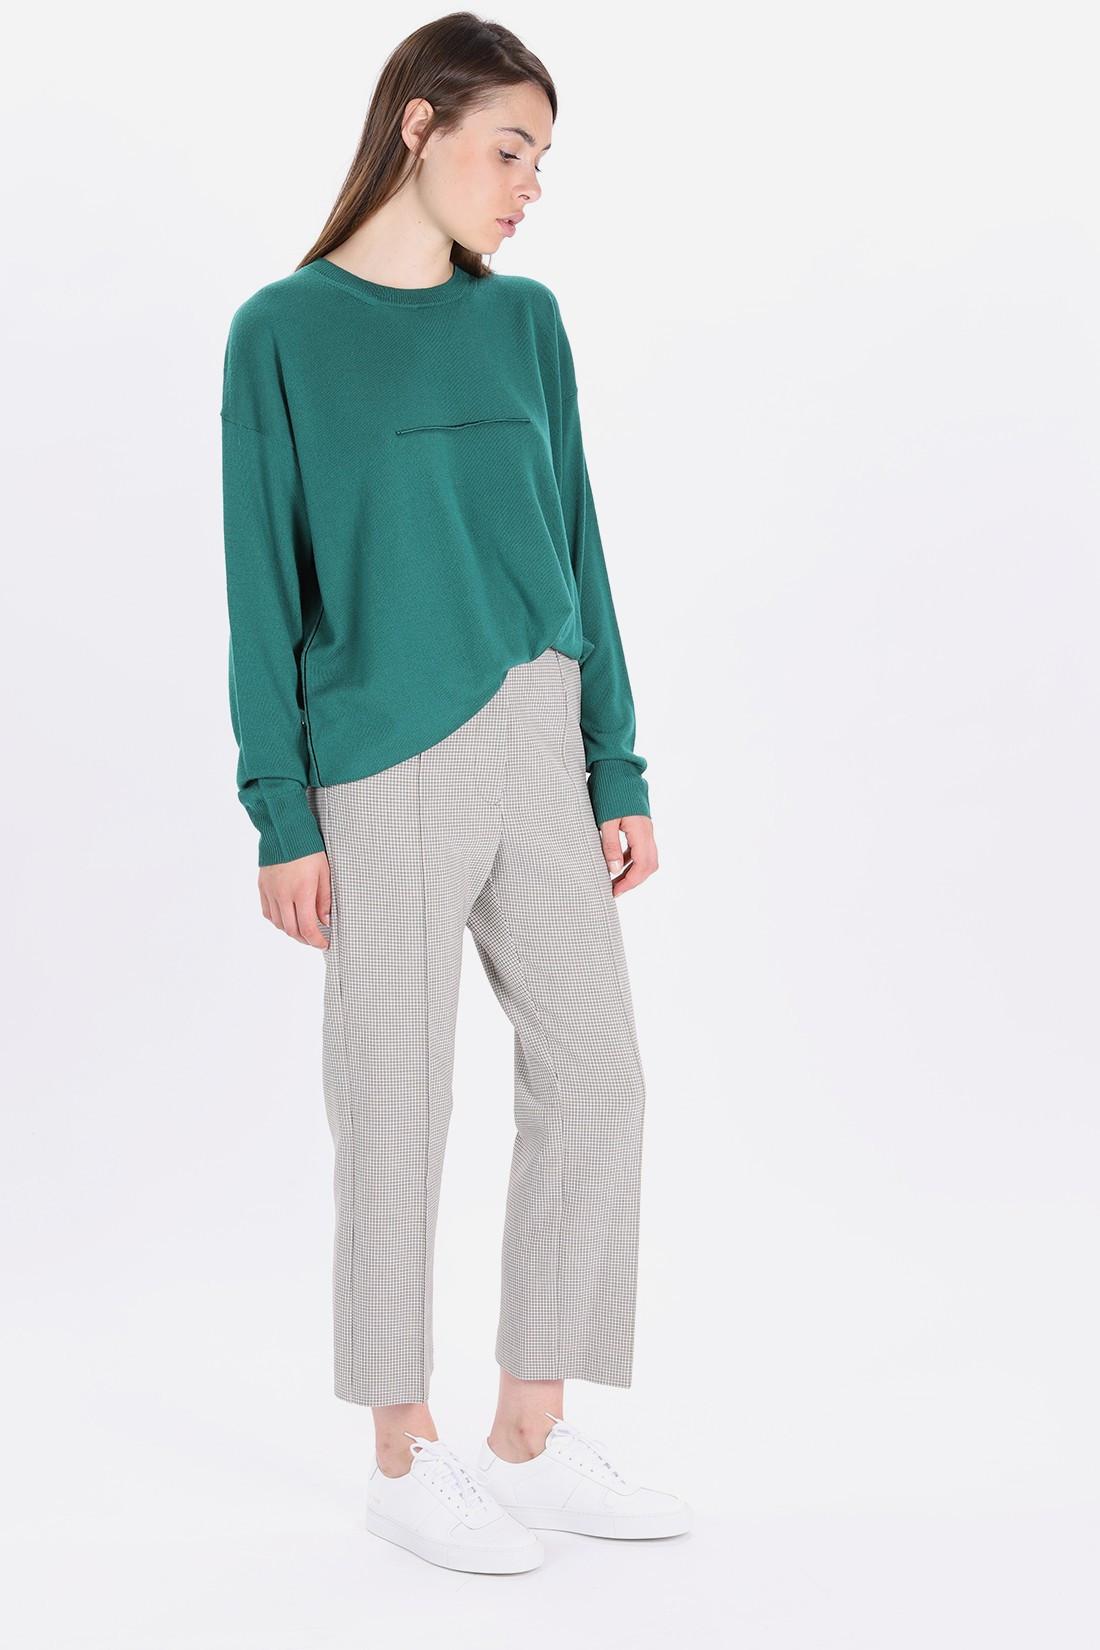 MM6 MAISON MARGIELA / S52ka0167 formal trouser Micro check